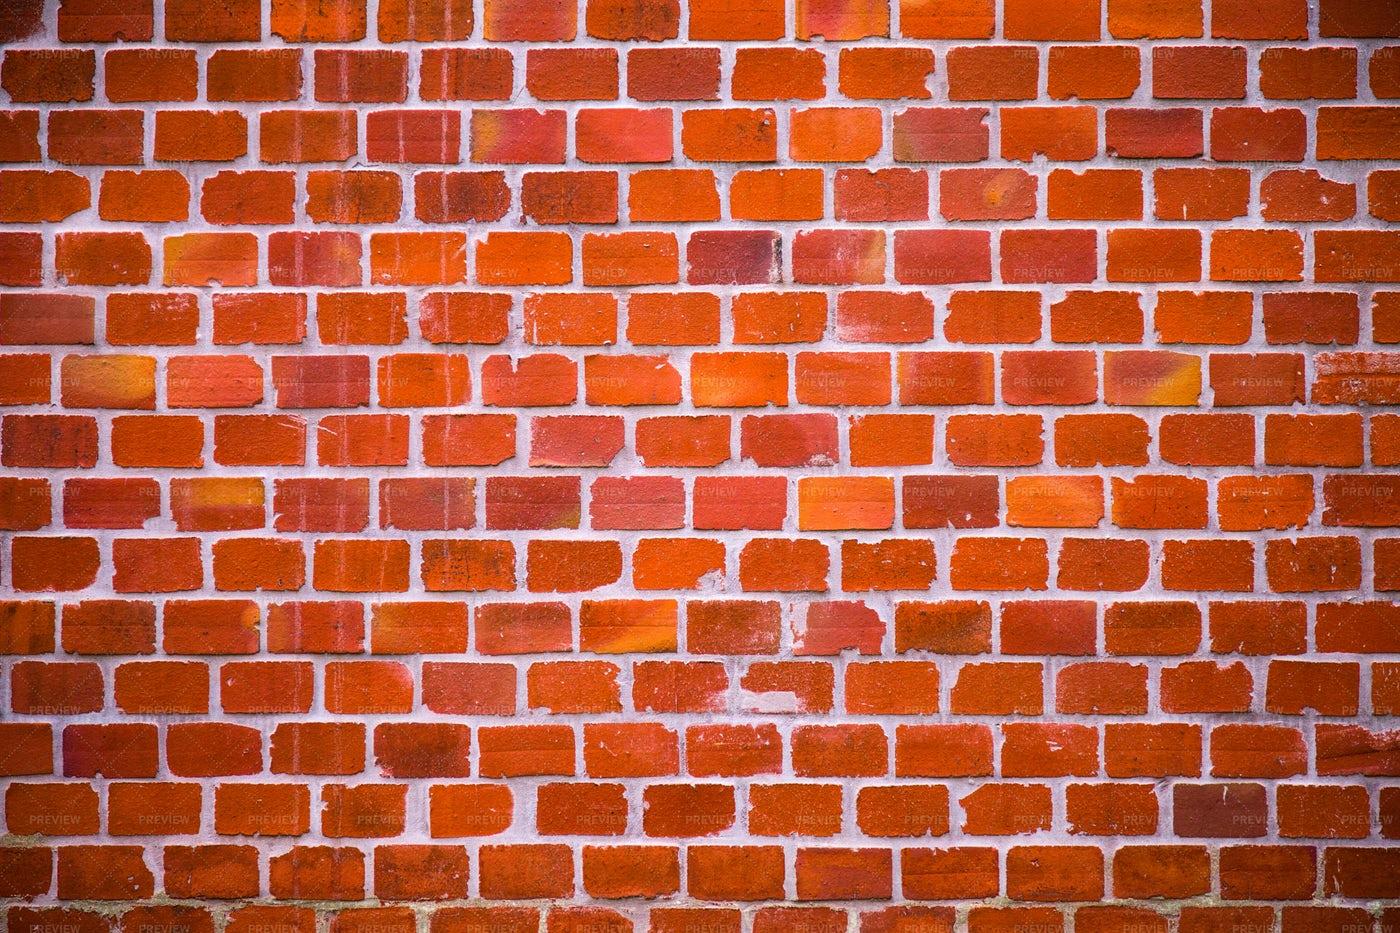 Red Stone Brick Wall: Stock Photos